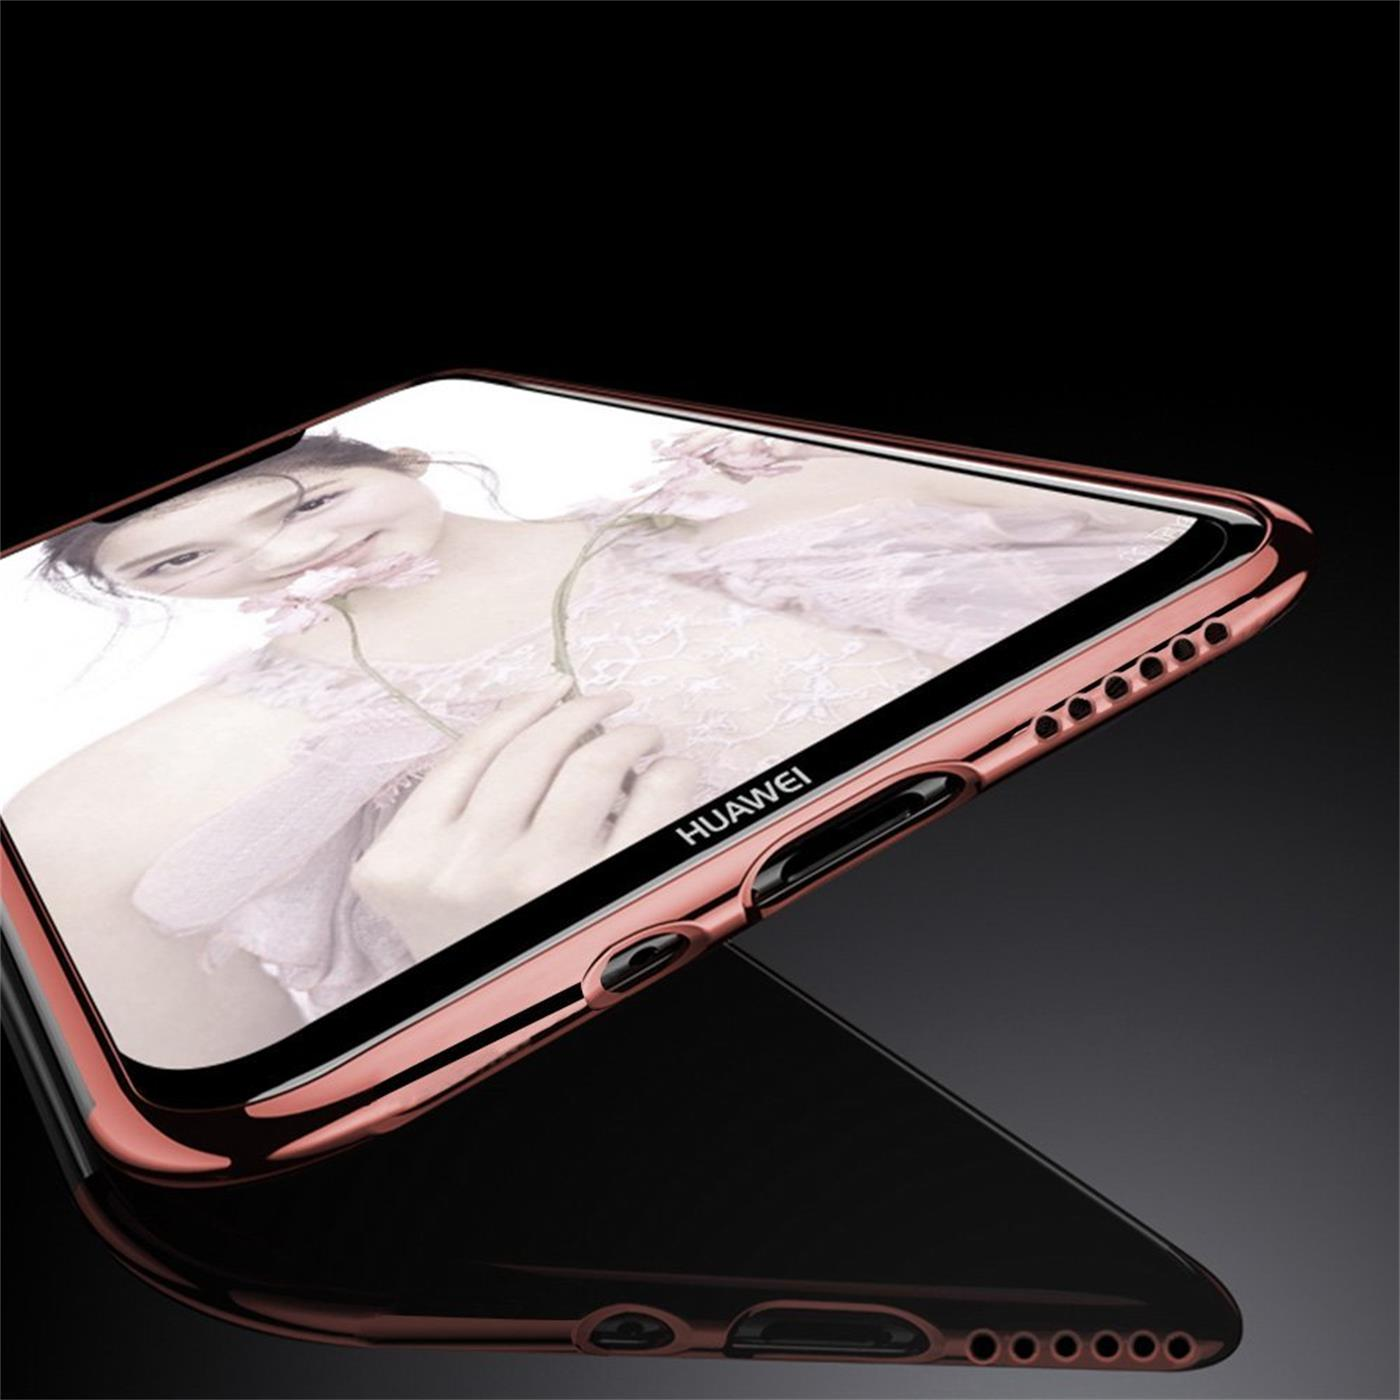 Silikon-Klar-Case-fuer-Huawei-p20-Lite-Ultra-Slim-Stossfeste-Gel-Rueckseite Indexbild 21